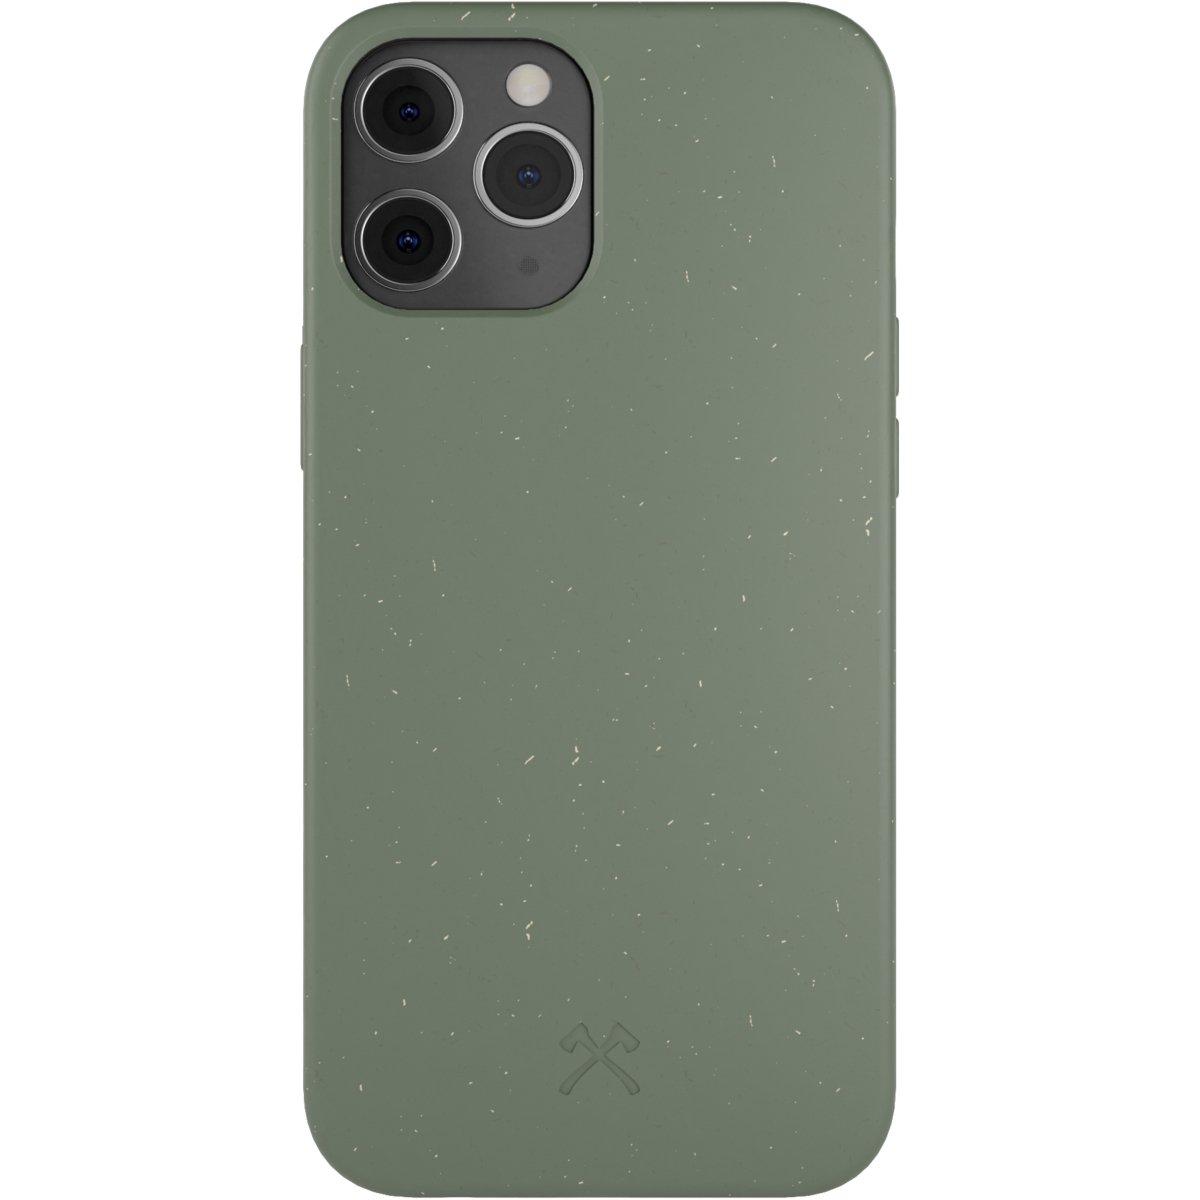 Woodcessories Bio Case AM iPhone 12 Pro Max - green